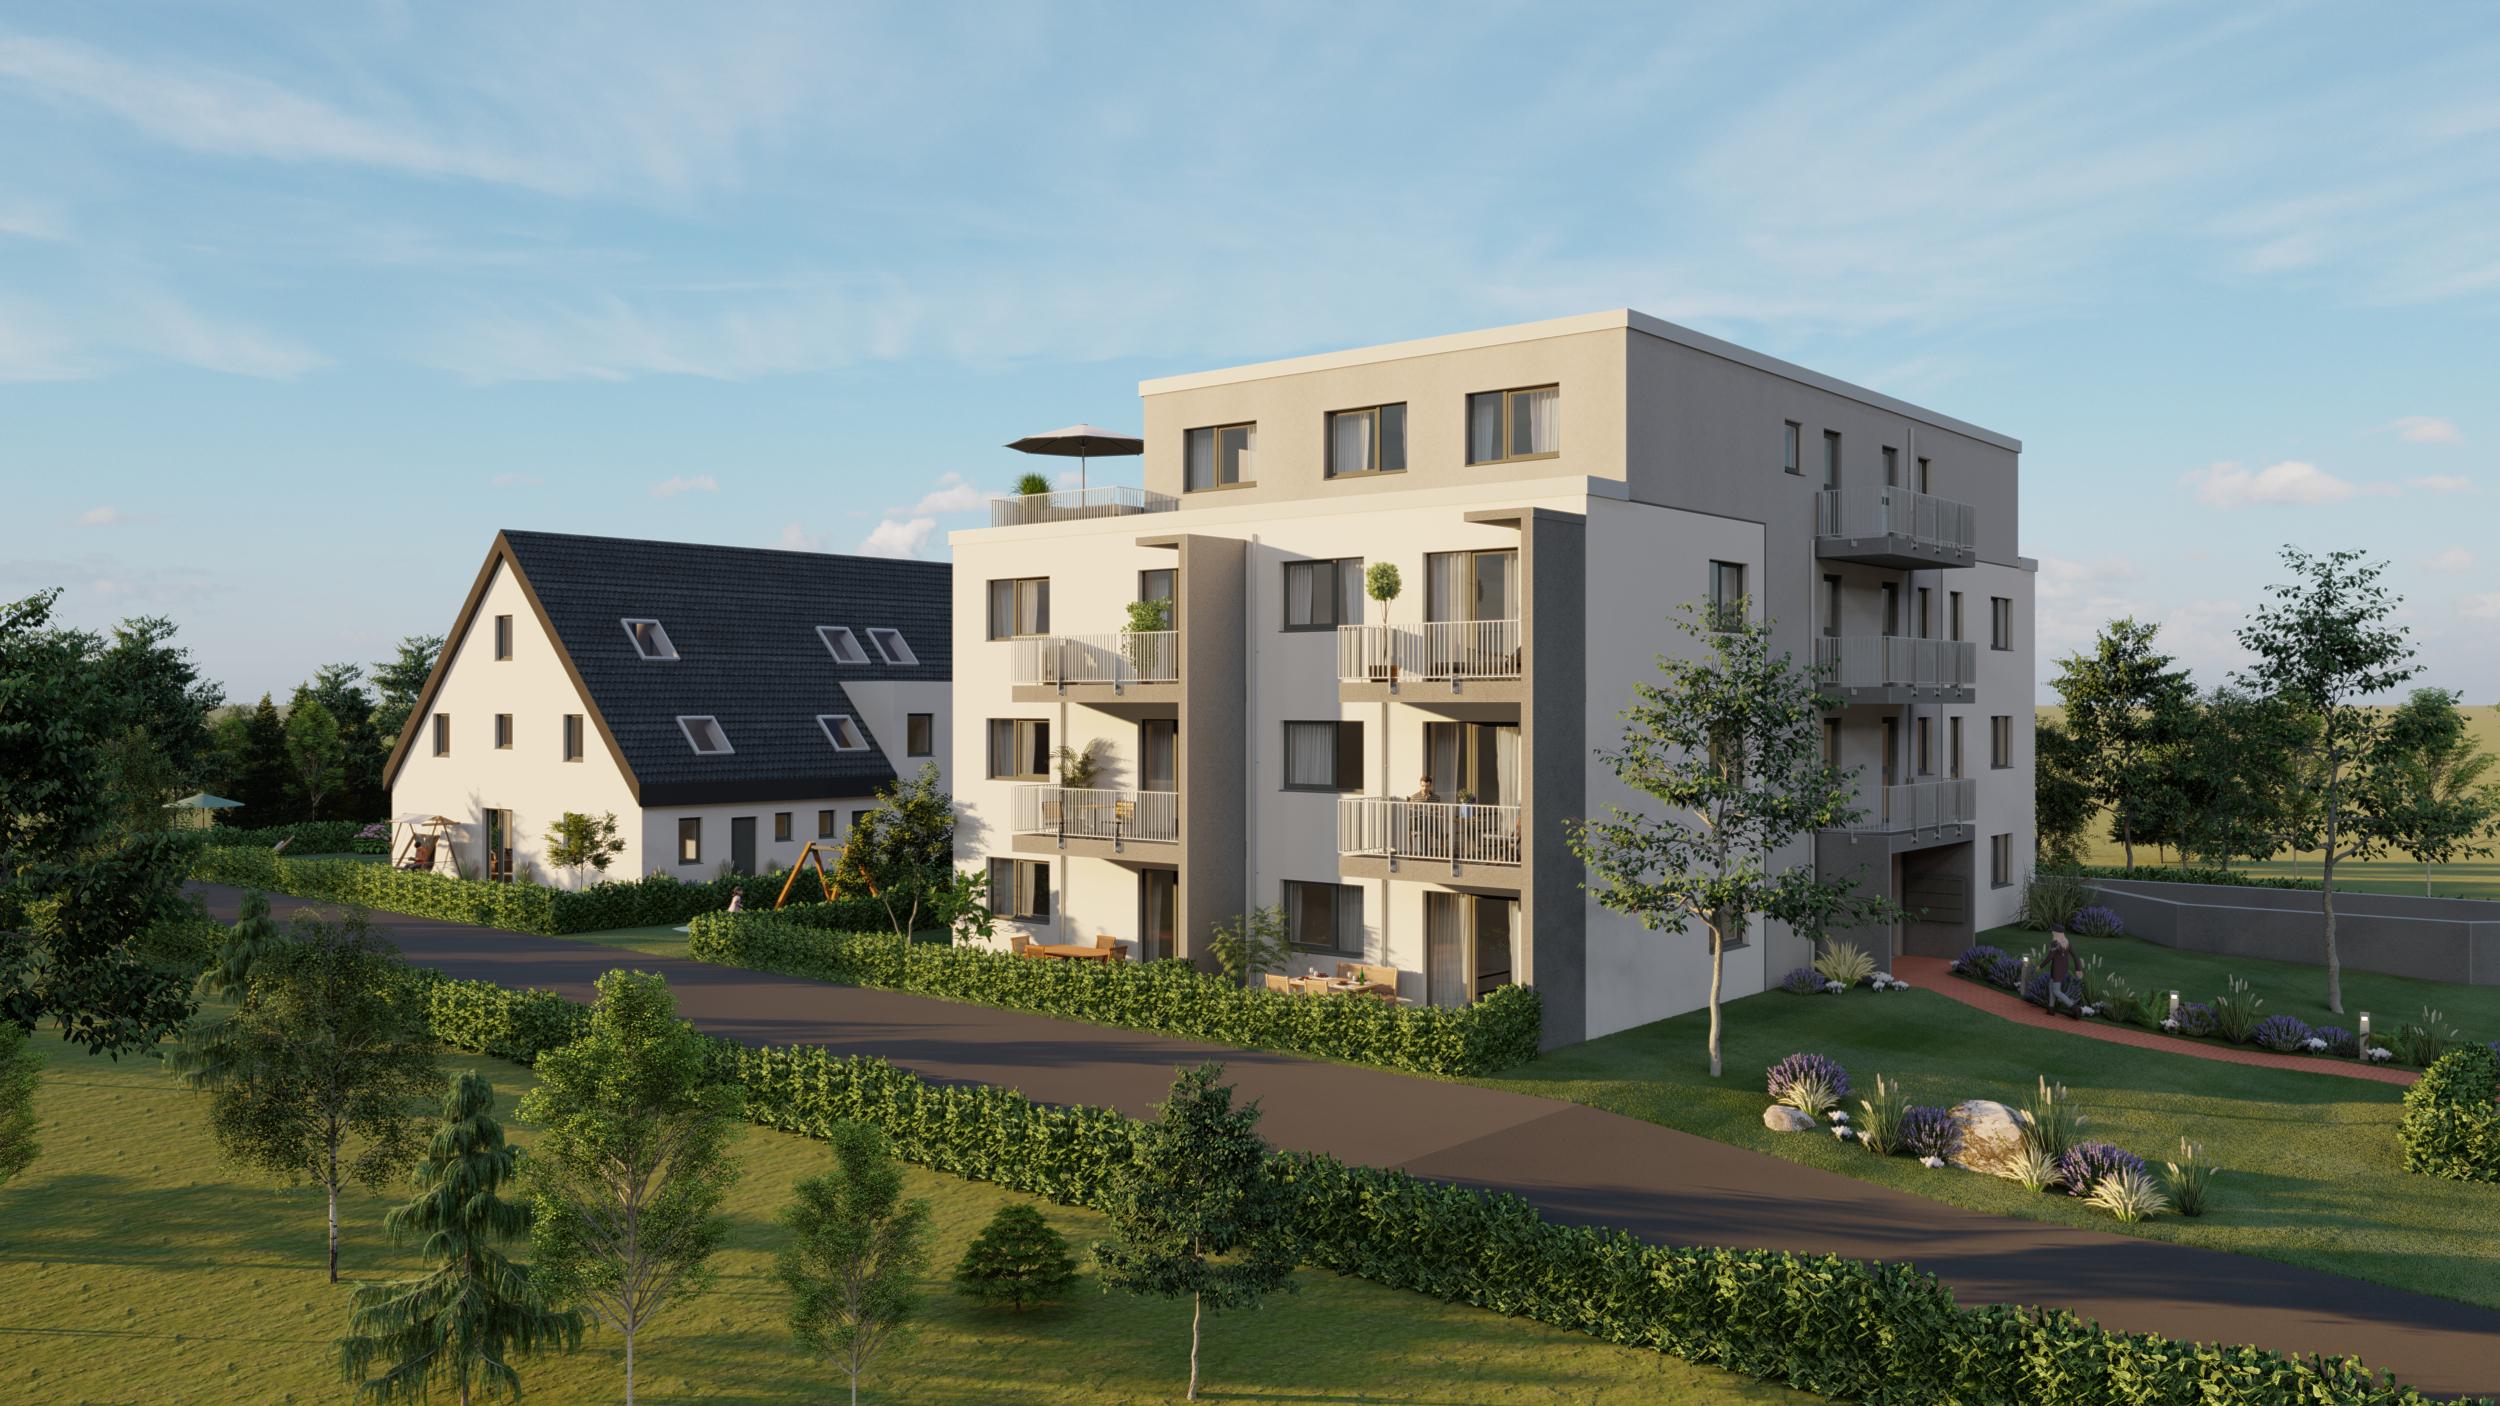 https://www.cm-projektbau.de/wp-content/uploads/2021/07/2021-07-26-IS-Visu-Mooi-Eigentumswohnungen.jpg